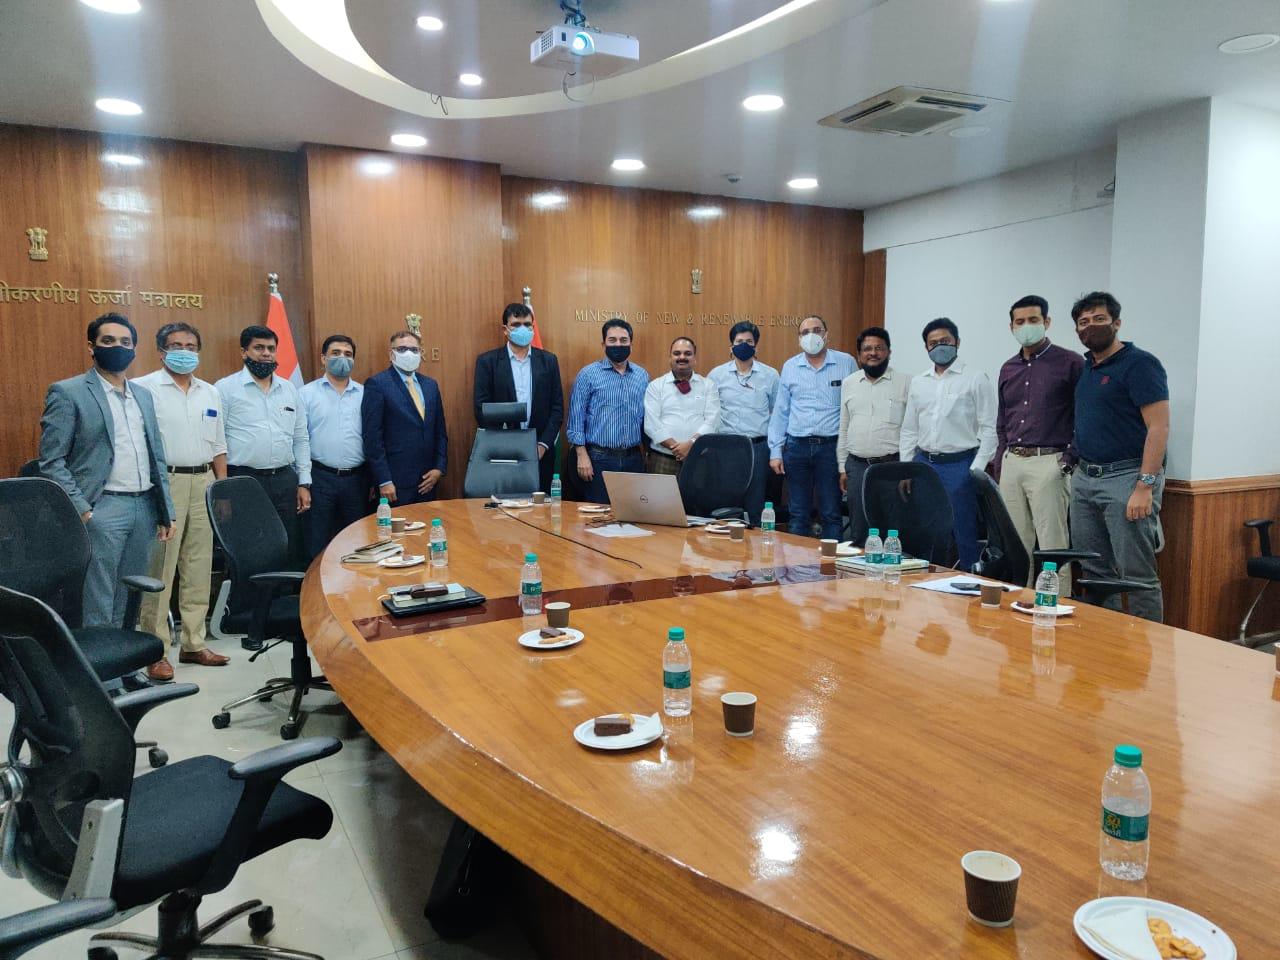 Indian Module Manufacturers Express Worry Over Expiring Safeguard Duty